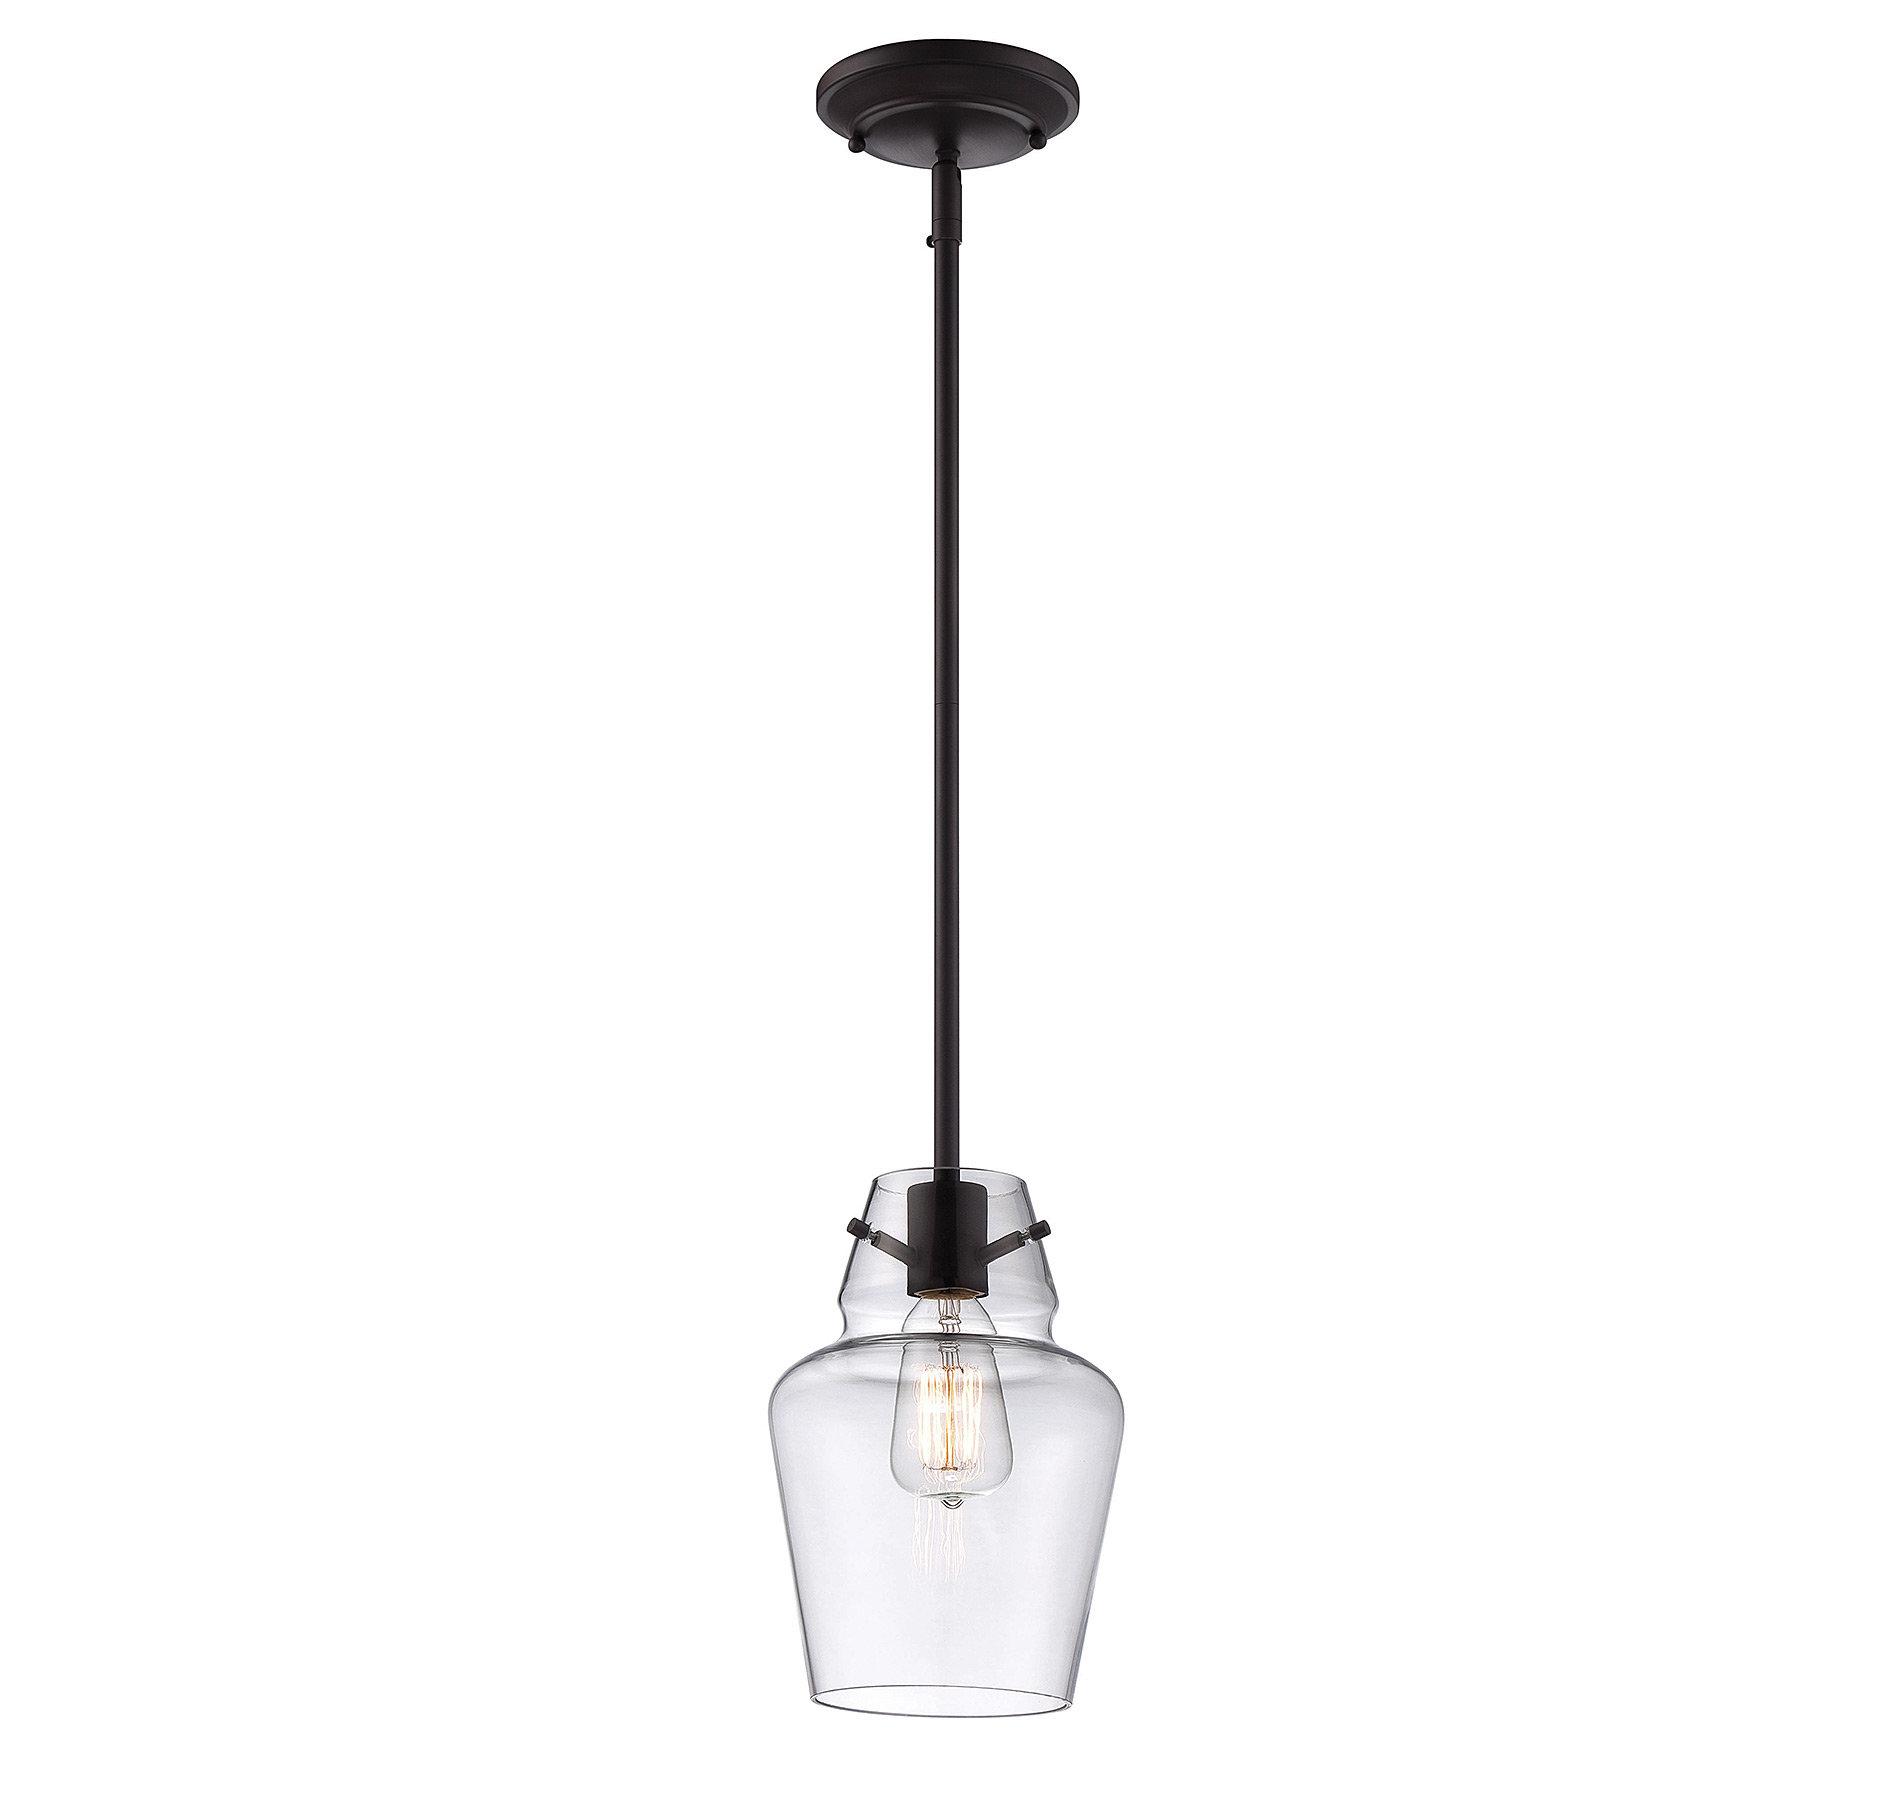 Roslindale 1 Light Bell Pendant Inside Nolan 1 Light Single Cylinder Pendants (Gallery 29 of 30)